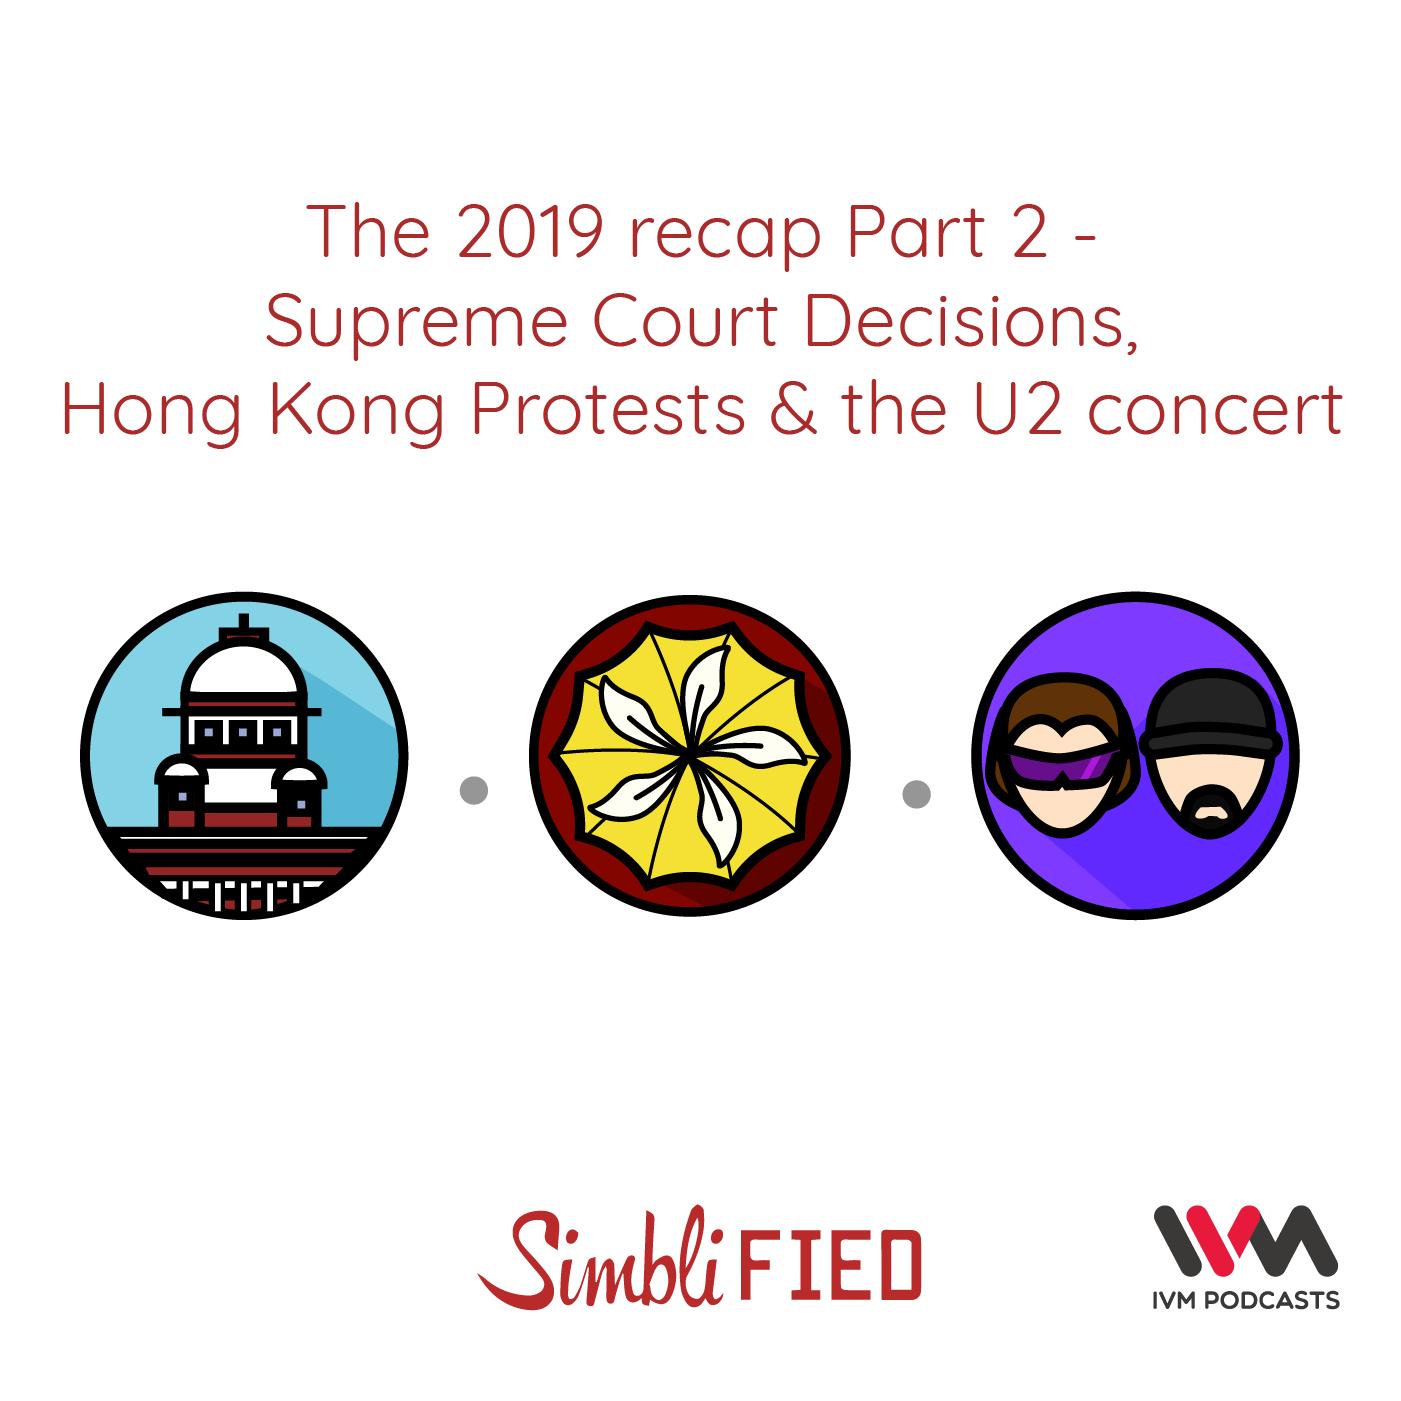 Ep. 162: The 2019 recap Part 2 - Supreme Court Decisions, Hong Kong Protests & the U2 concert